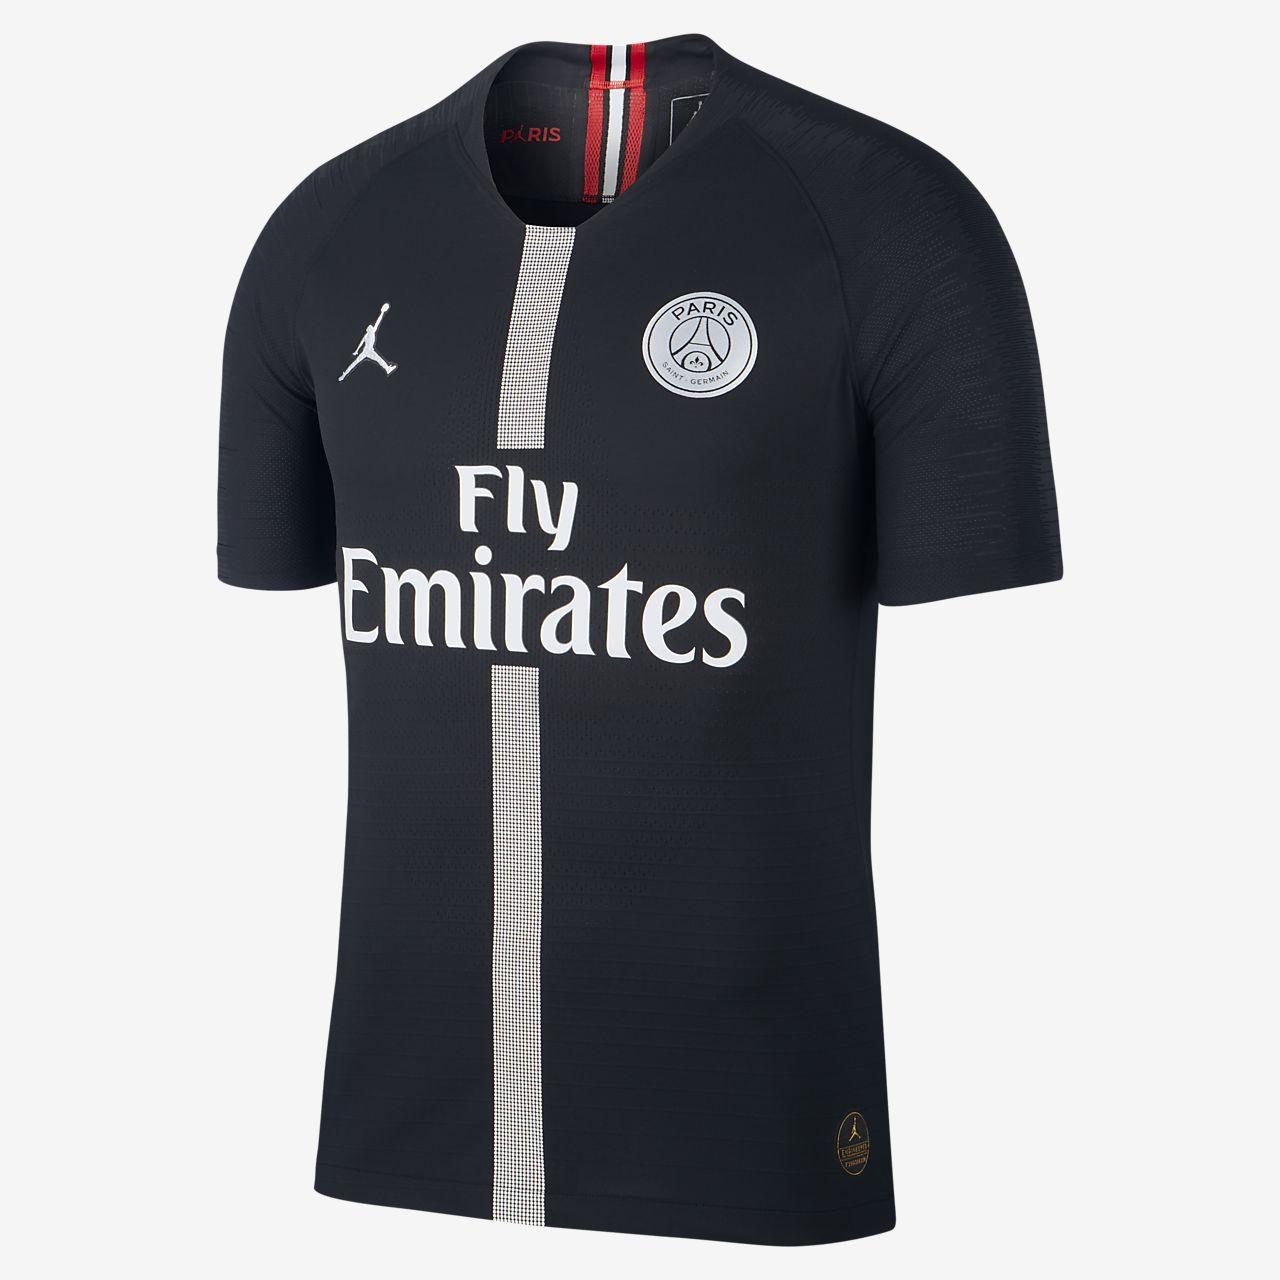 576603affdf54 Camiseta de fútbol para hombre Paris Saint-Germain Vapor alternativa ...